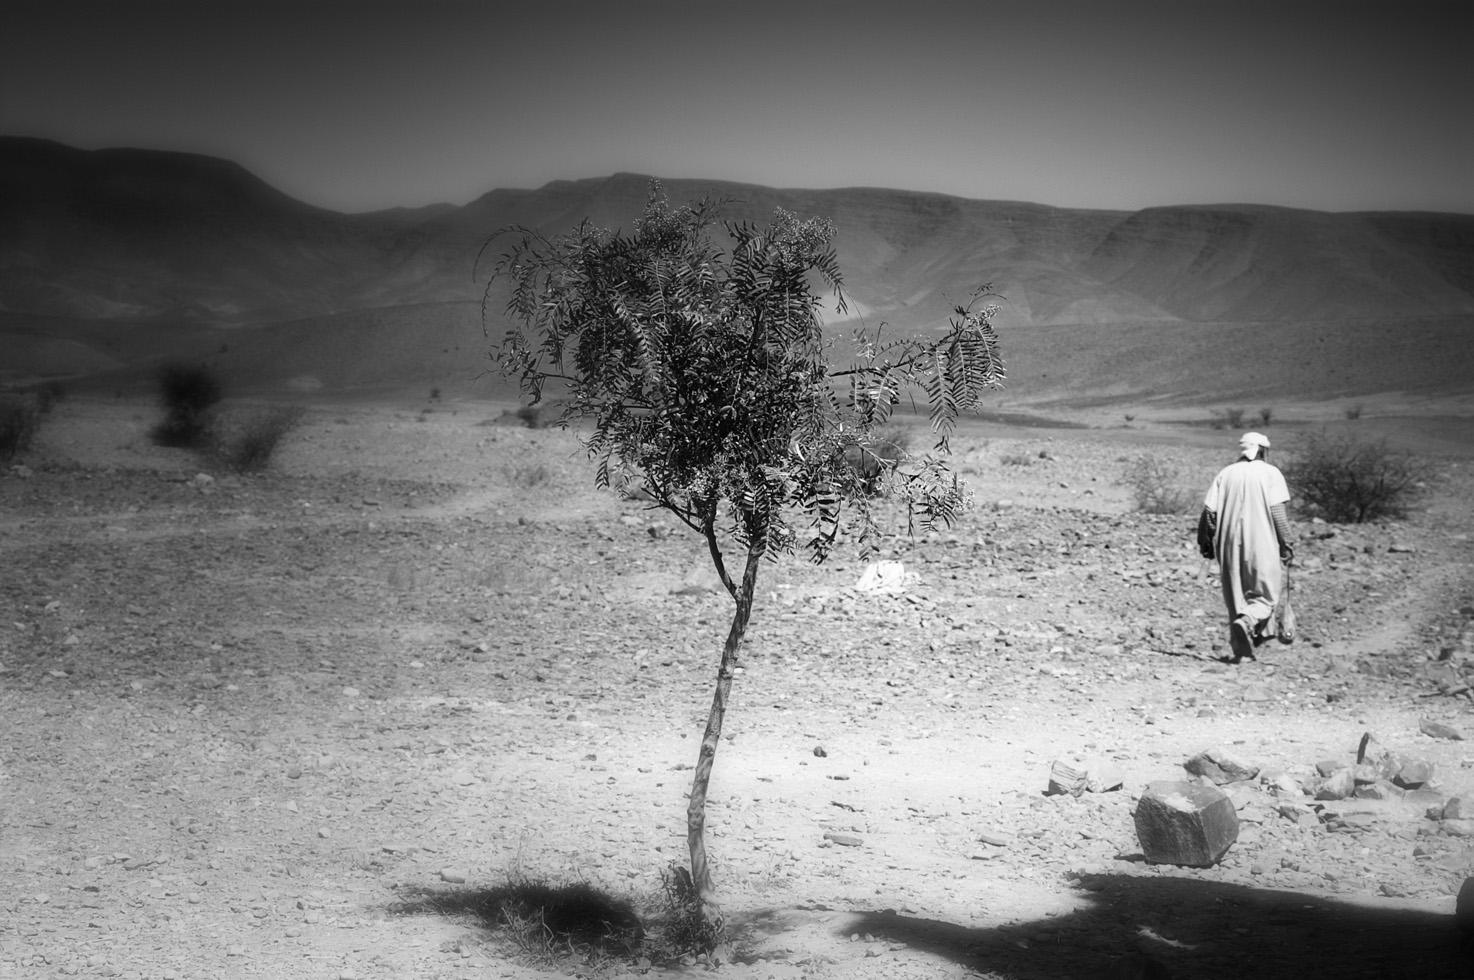 Maroc_25